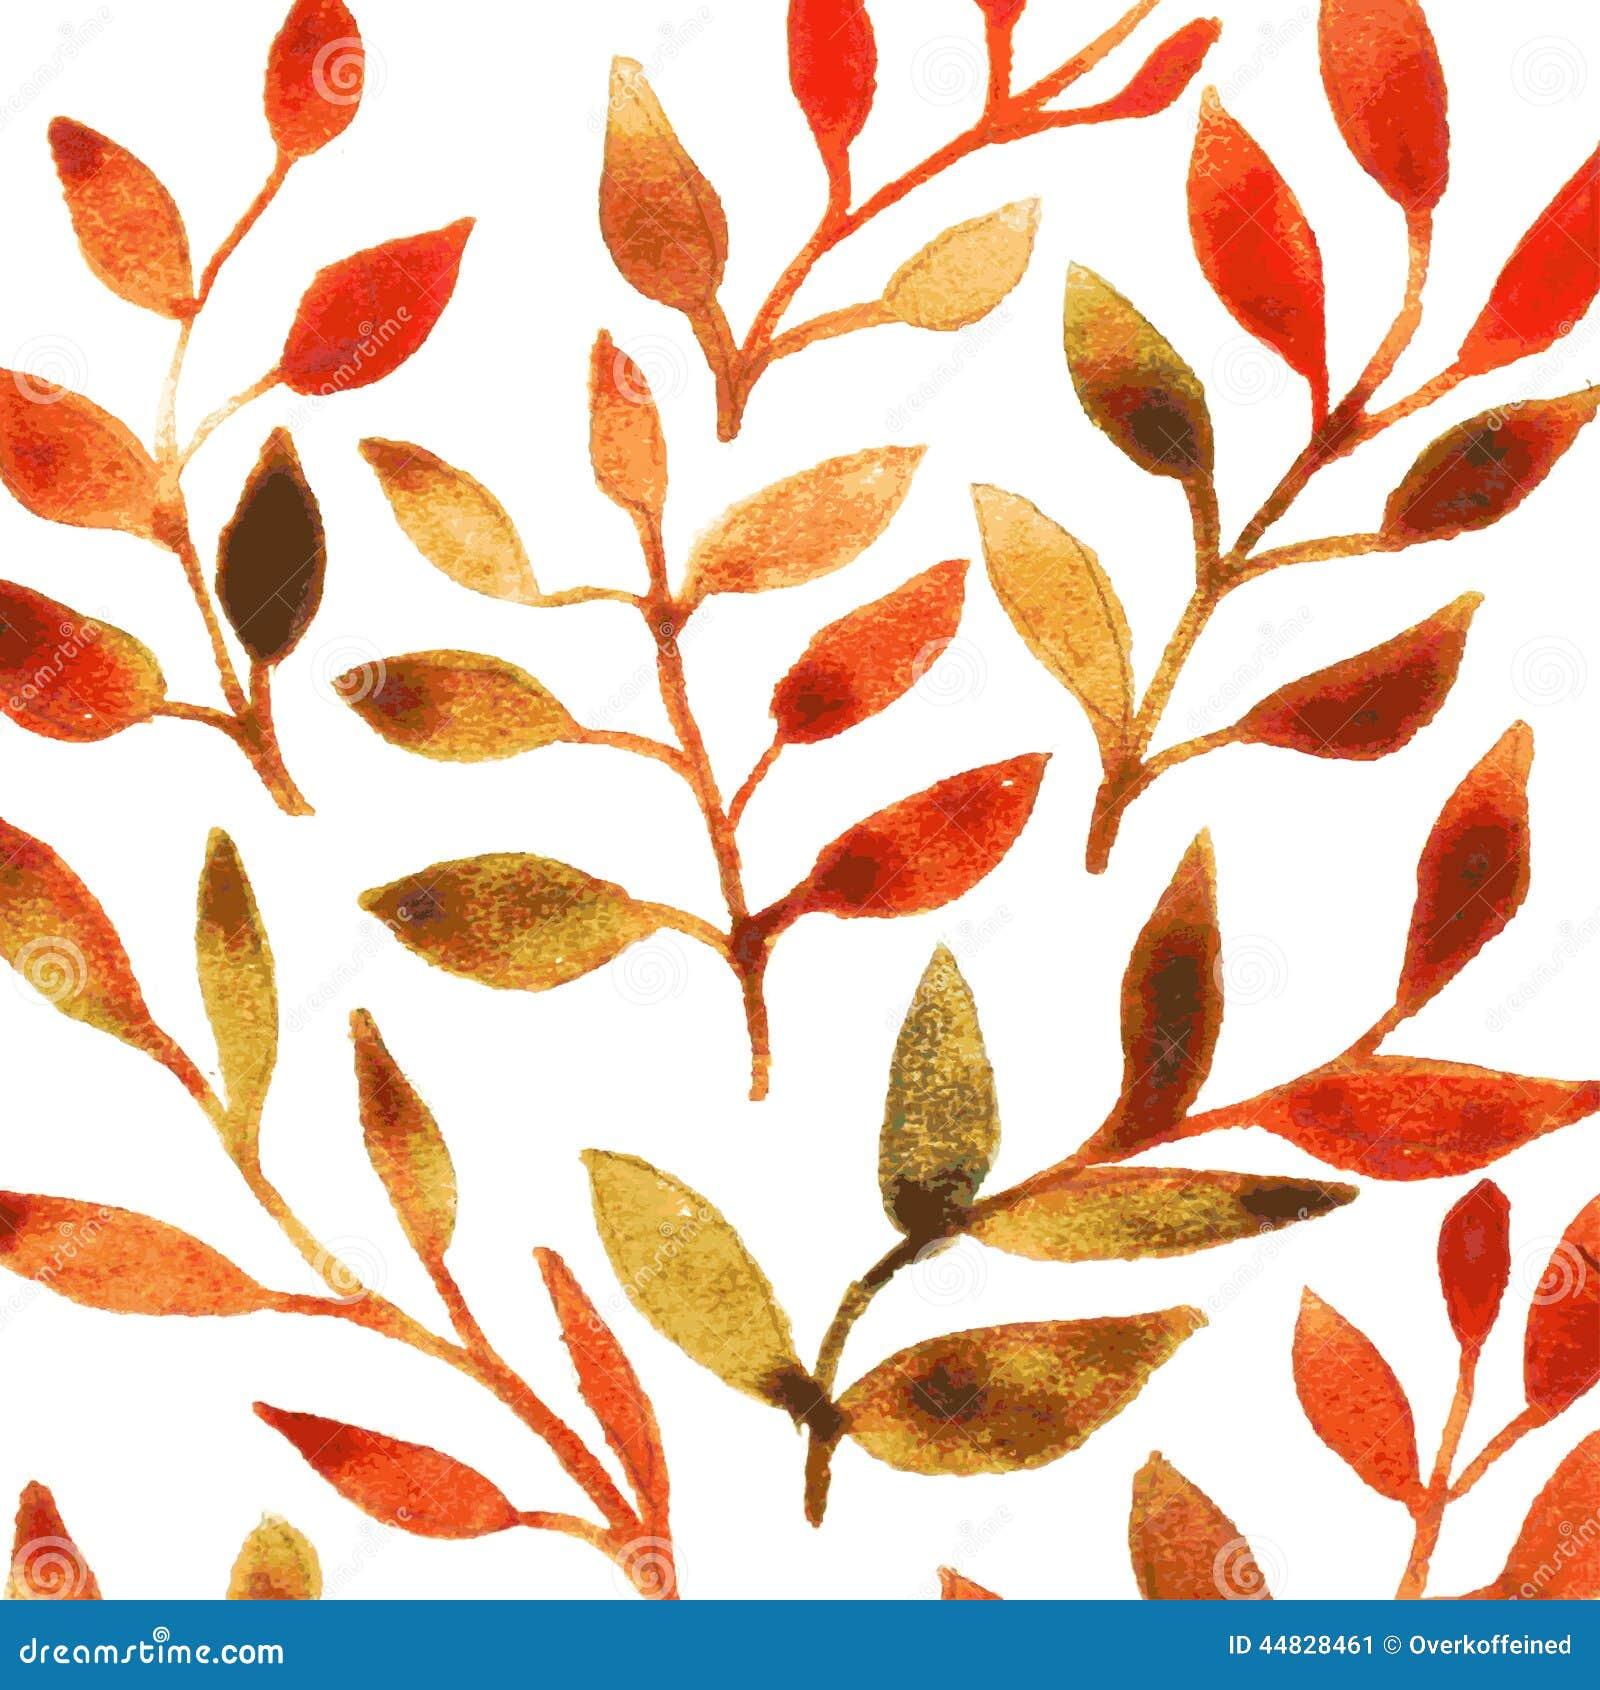 Fall Leaf Watercolor Patterns Patterns Kid